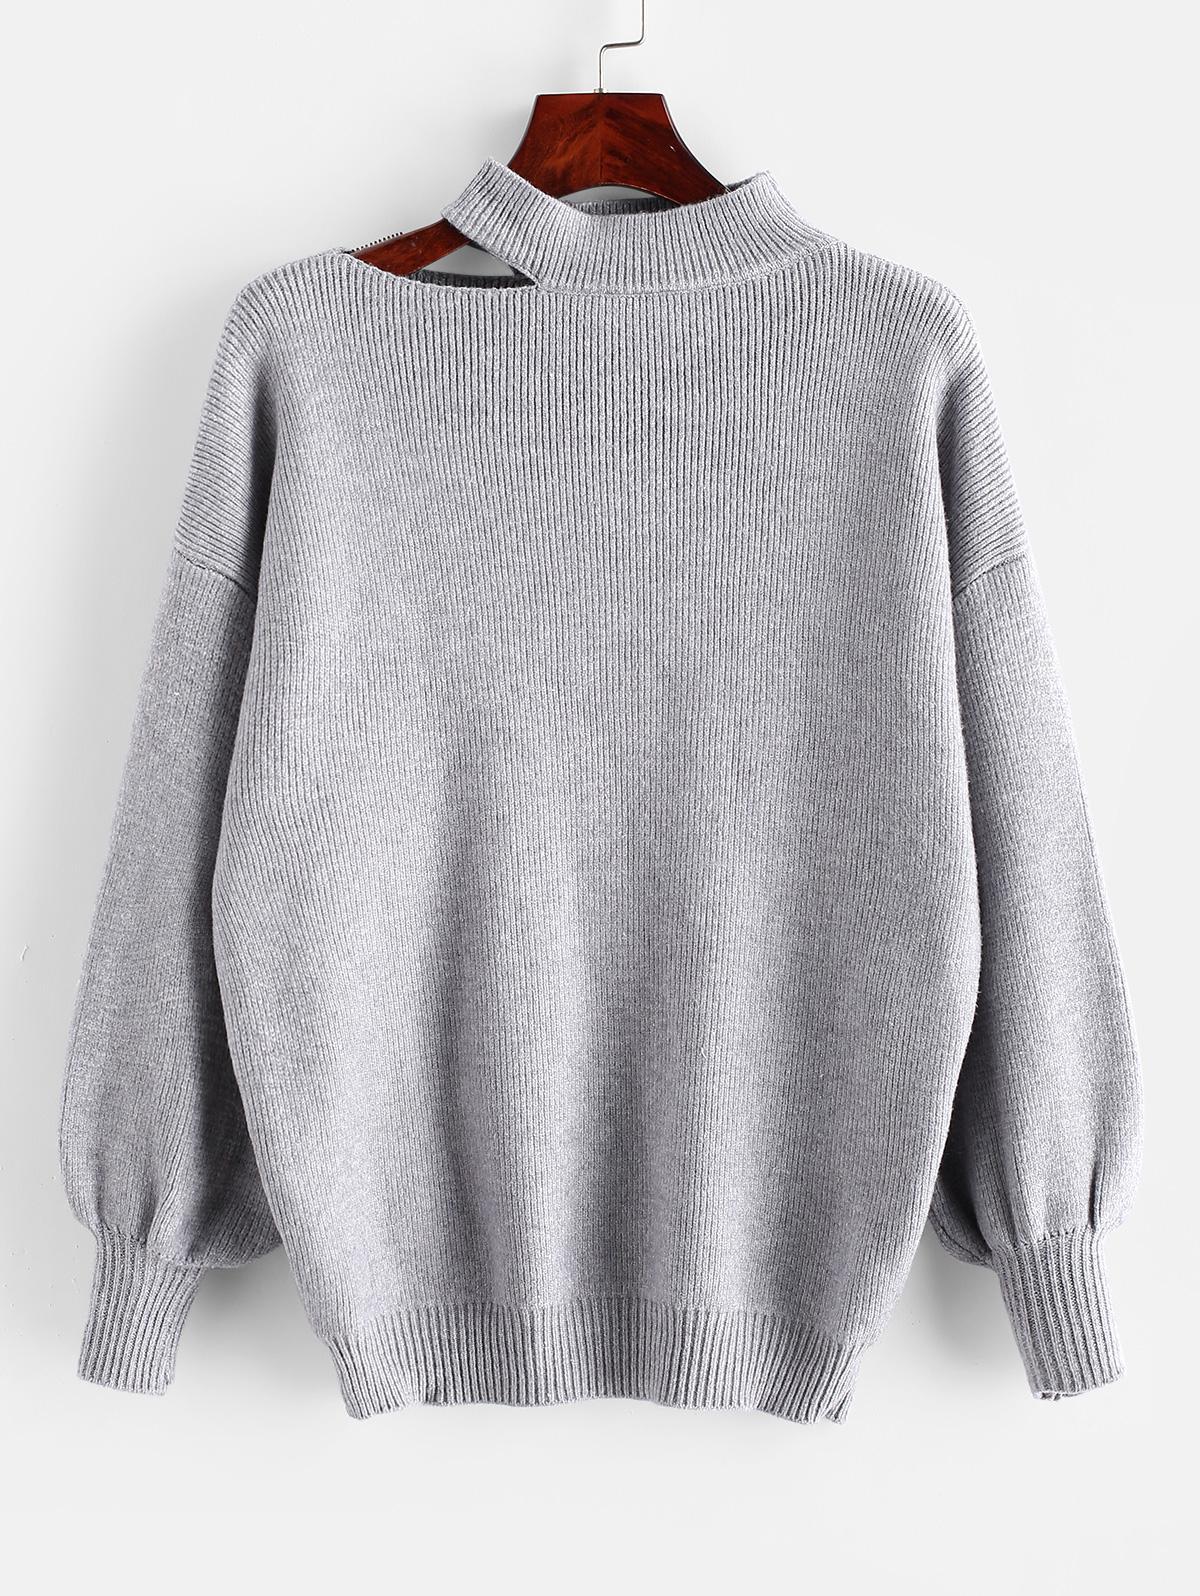 Cutout High Neck Drop Shoulder Sweater